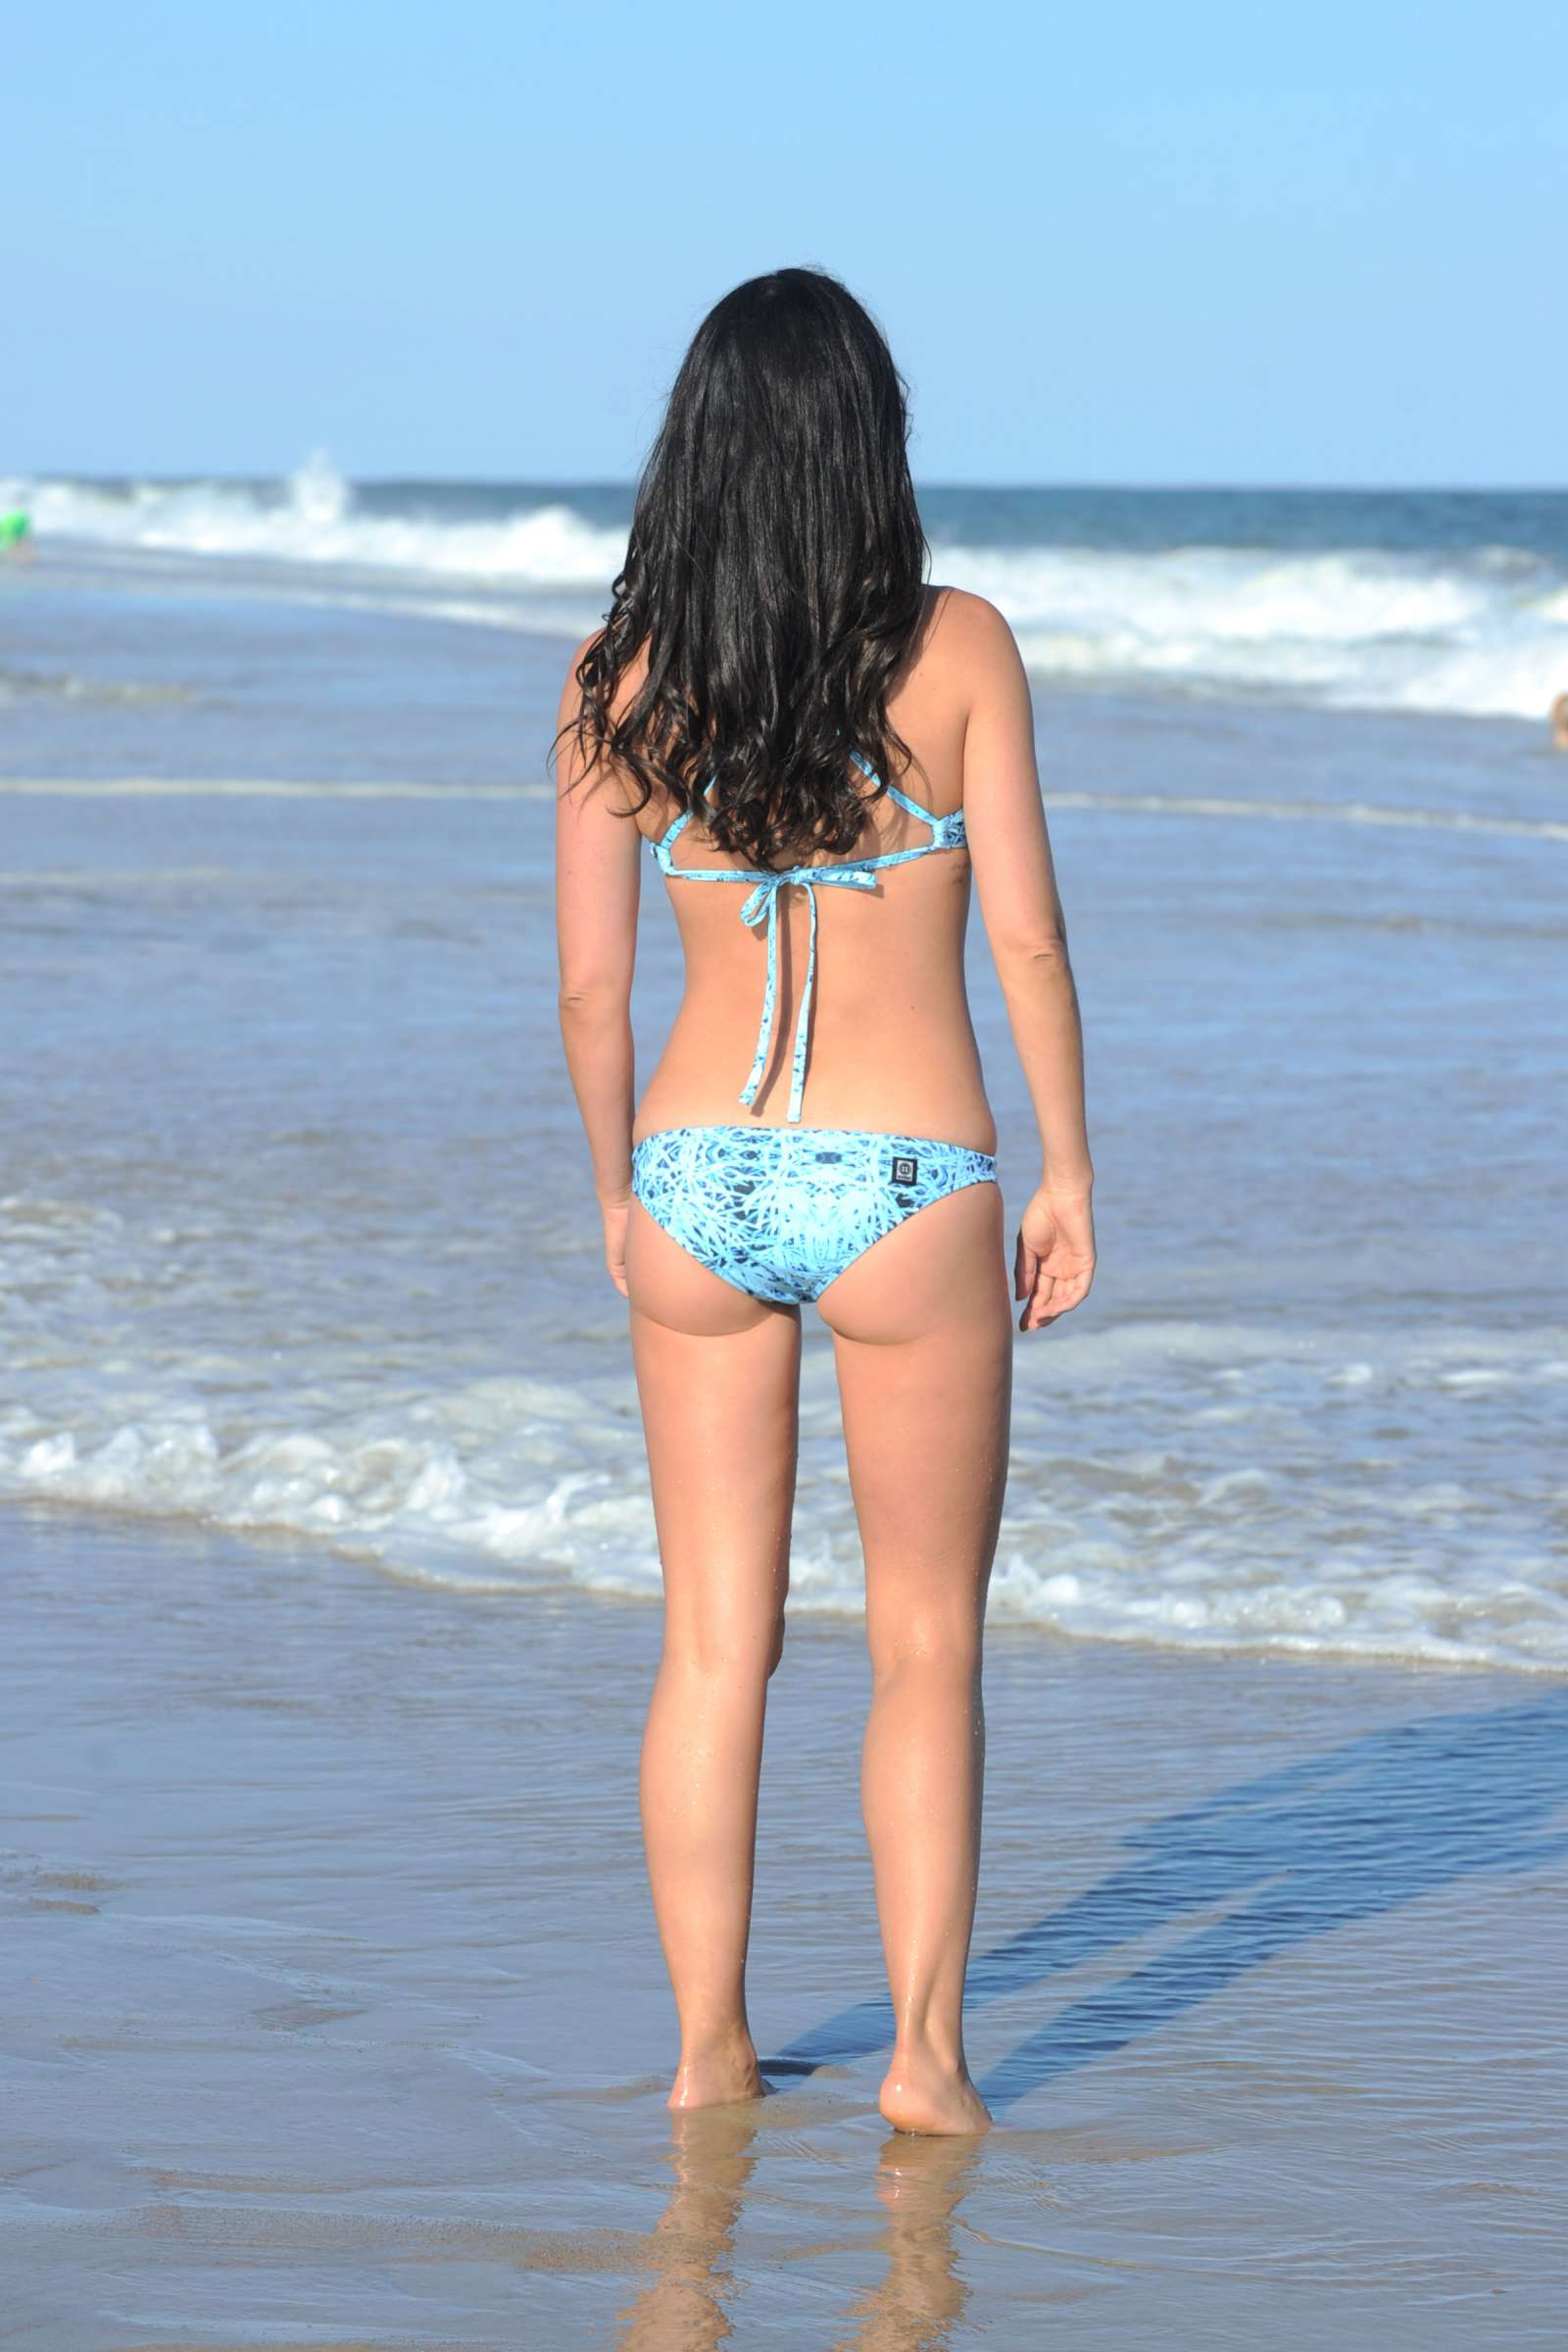 image Candid beach bikini butt ass west michigan booty 2 hotties